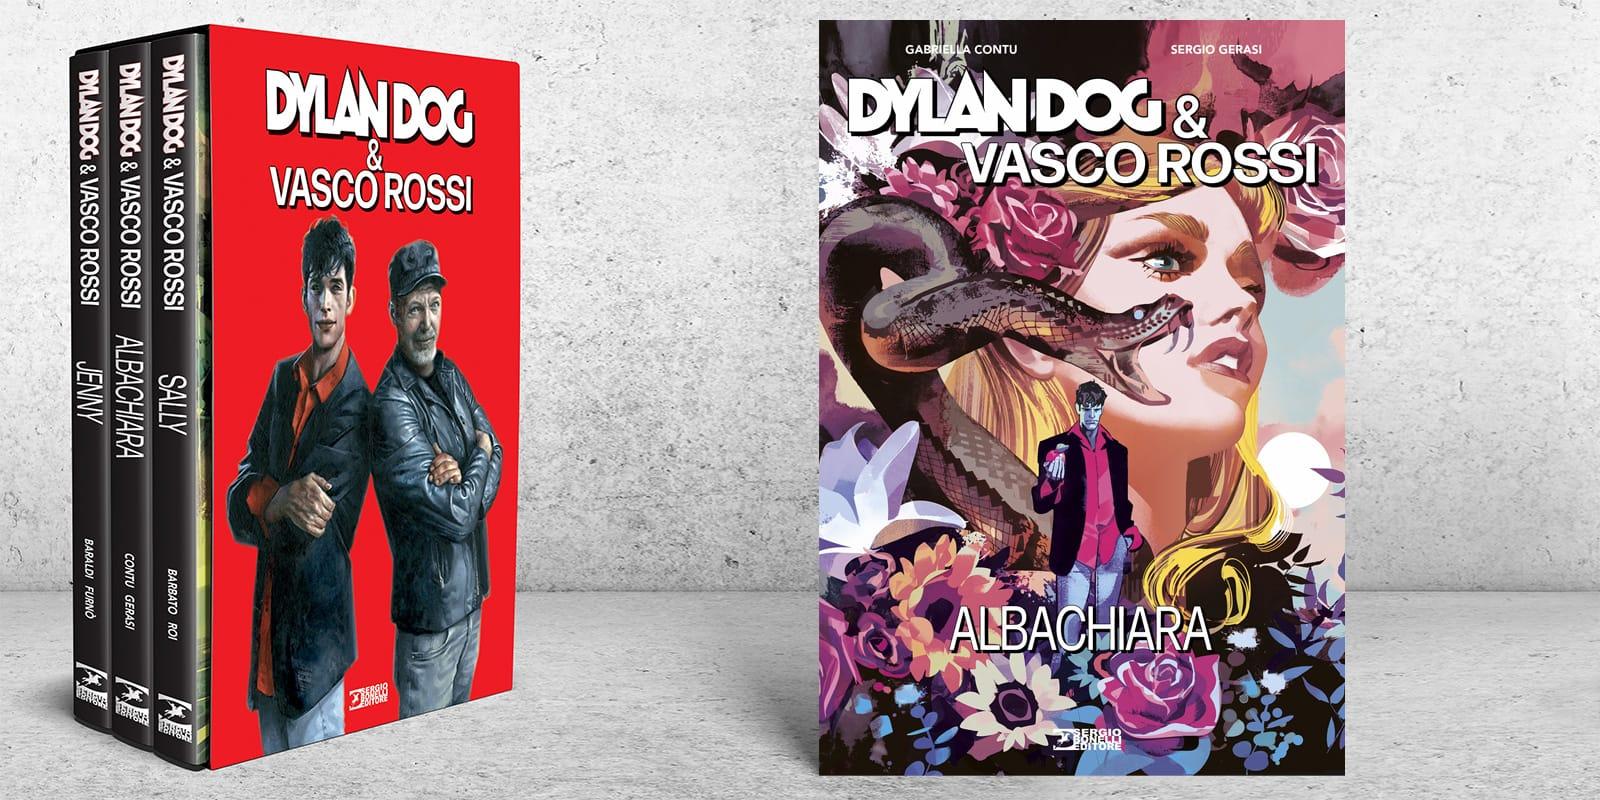 Dylan-Dog-Vasco-Rossi-Albachiara